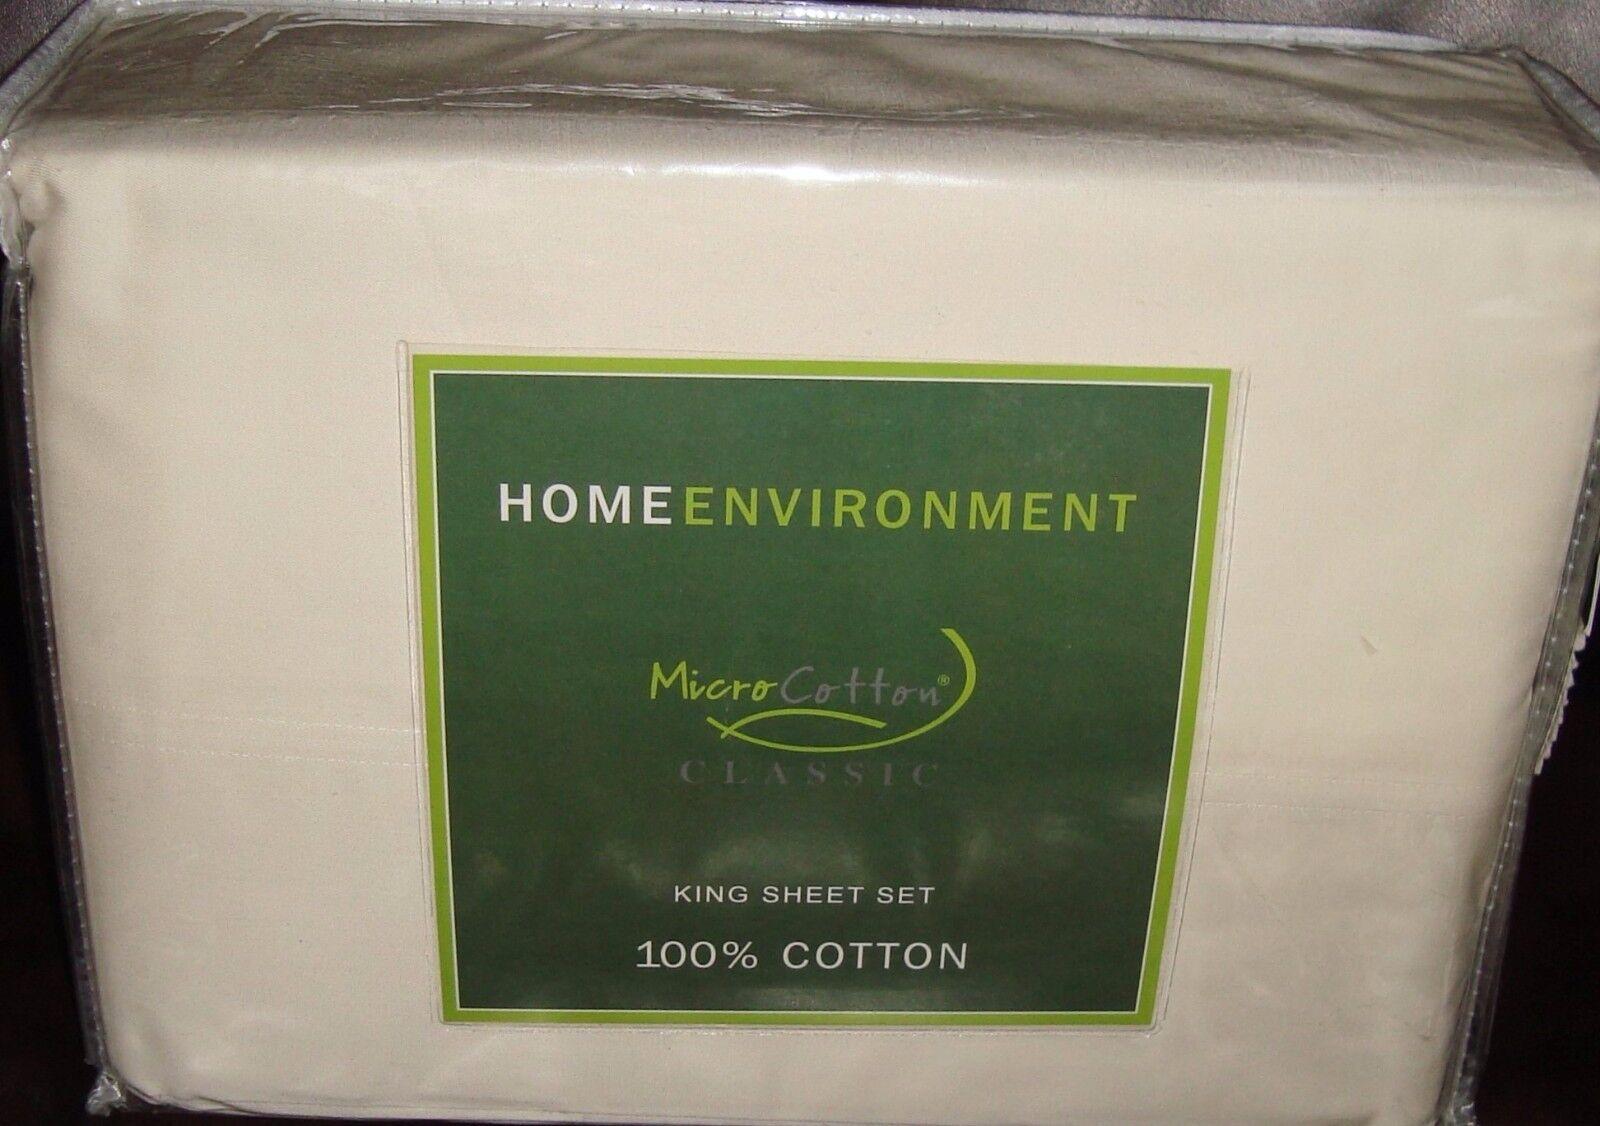 EnvironneHommest Domestique 350 threadcount Micro Coton Classic 4 PIECES roi Sheet Set Ivoire NEUF